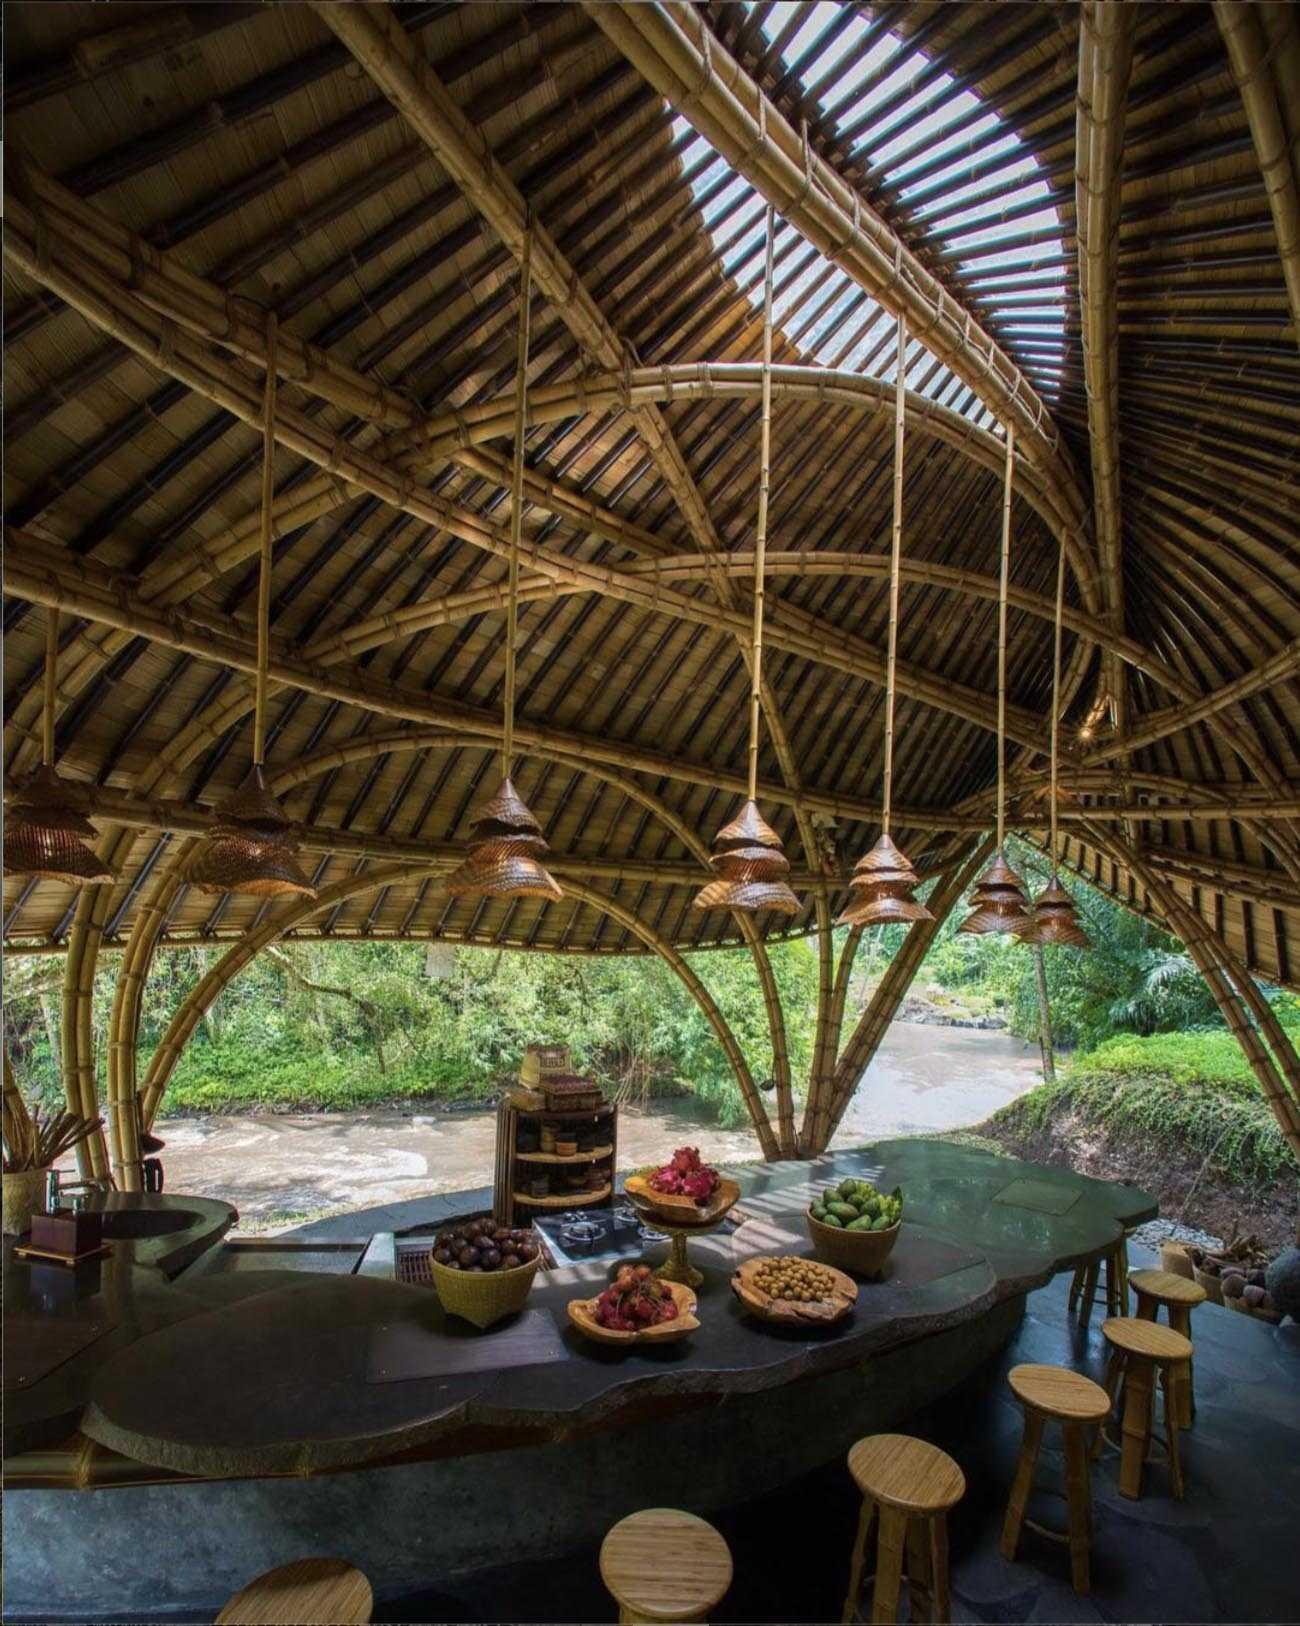 Agung Budi Raharsa | Architecture & Engineering Sokasi Bamboo Cooking Class / School - Bali Bali, Indonesia Bali, Indonesia Agung-Budi-Raharsa-Sokasi-Cooking-Class-School-Bali   88755